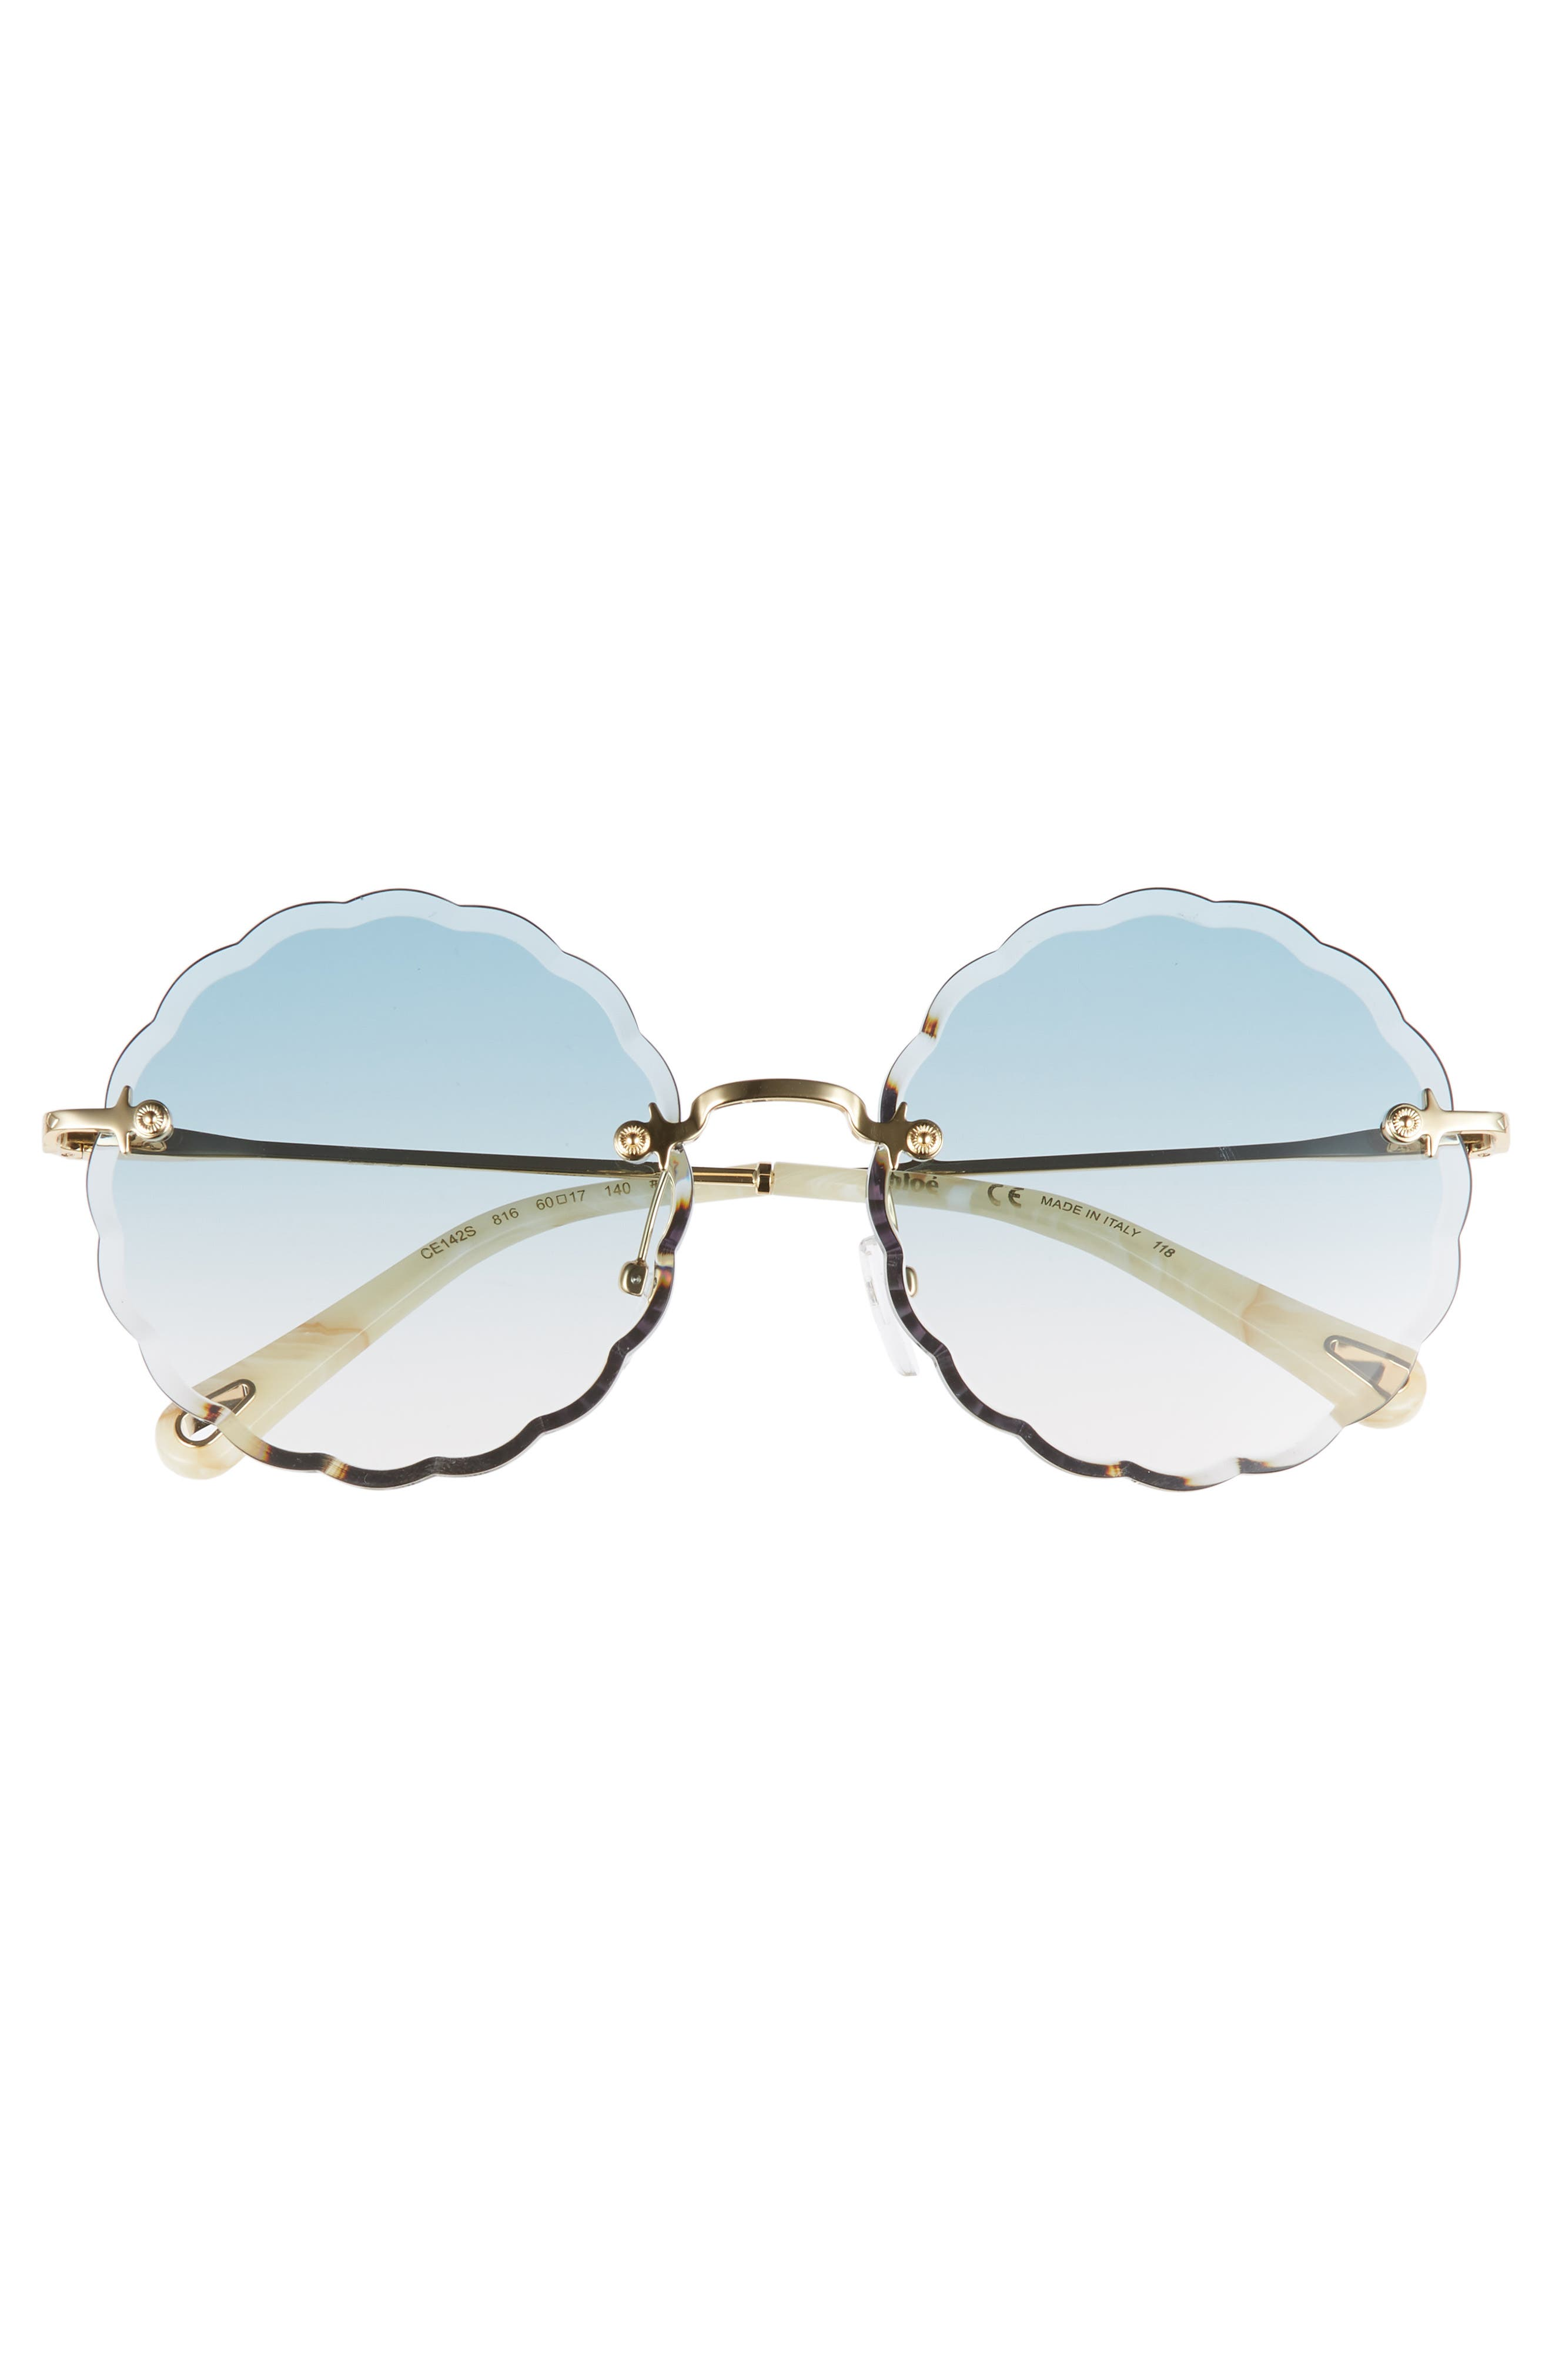 Rosie 60mm Scalloped Rimless Sunglasses,                             Alternate thumbnail 3, color,                             GOLD/ GRADIENT BLUE